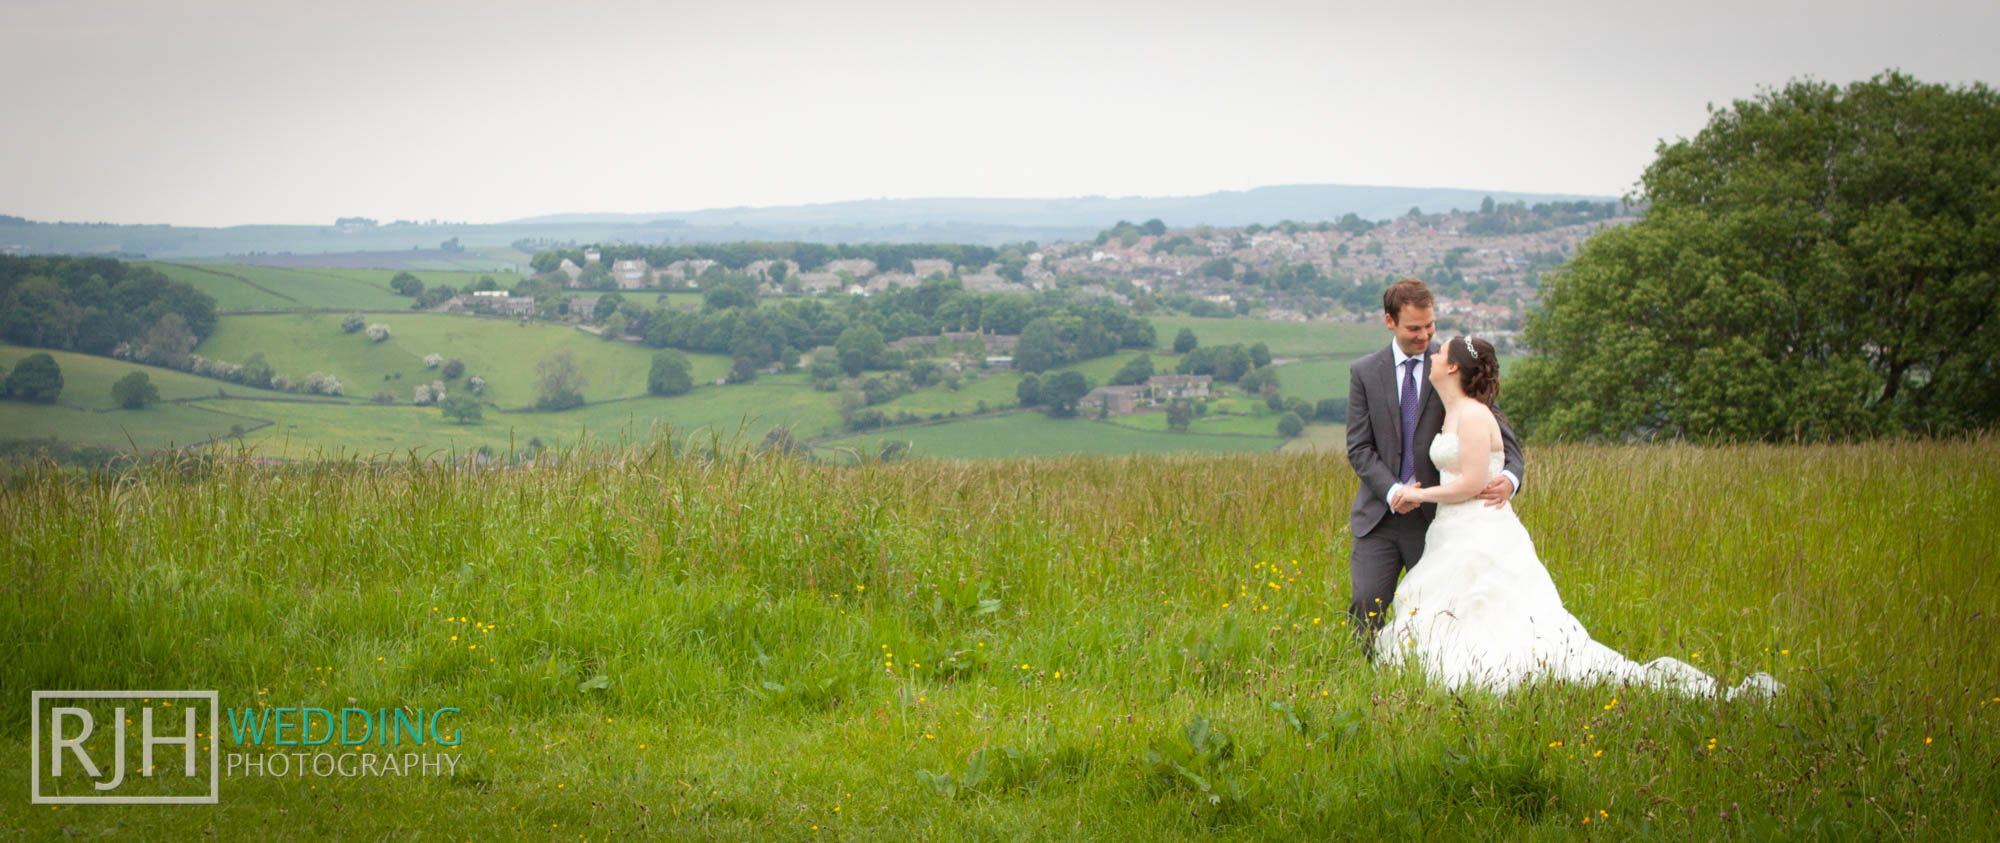 RJH Wedding Photography_2014 highlights_21.jpg